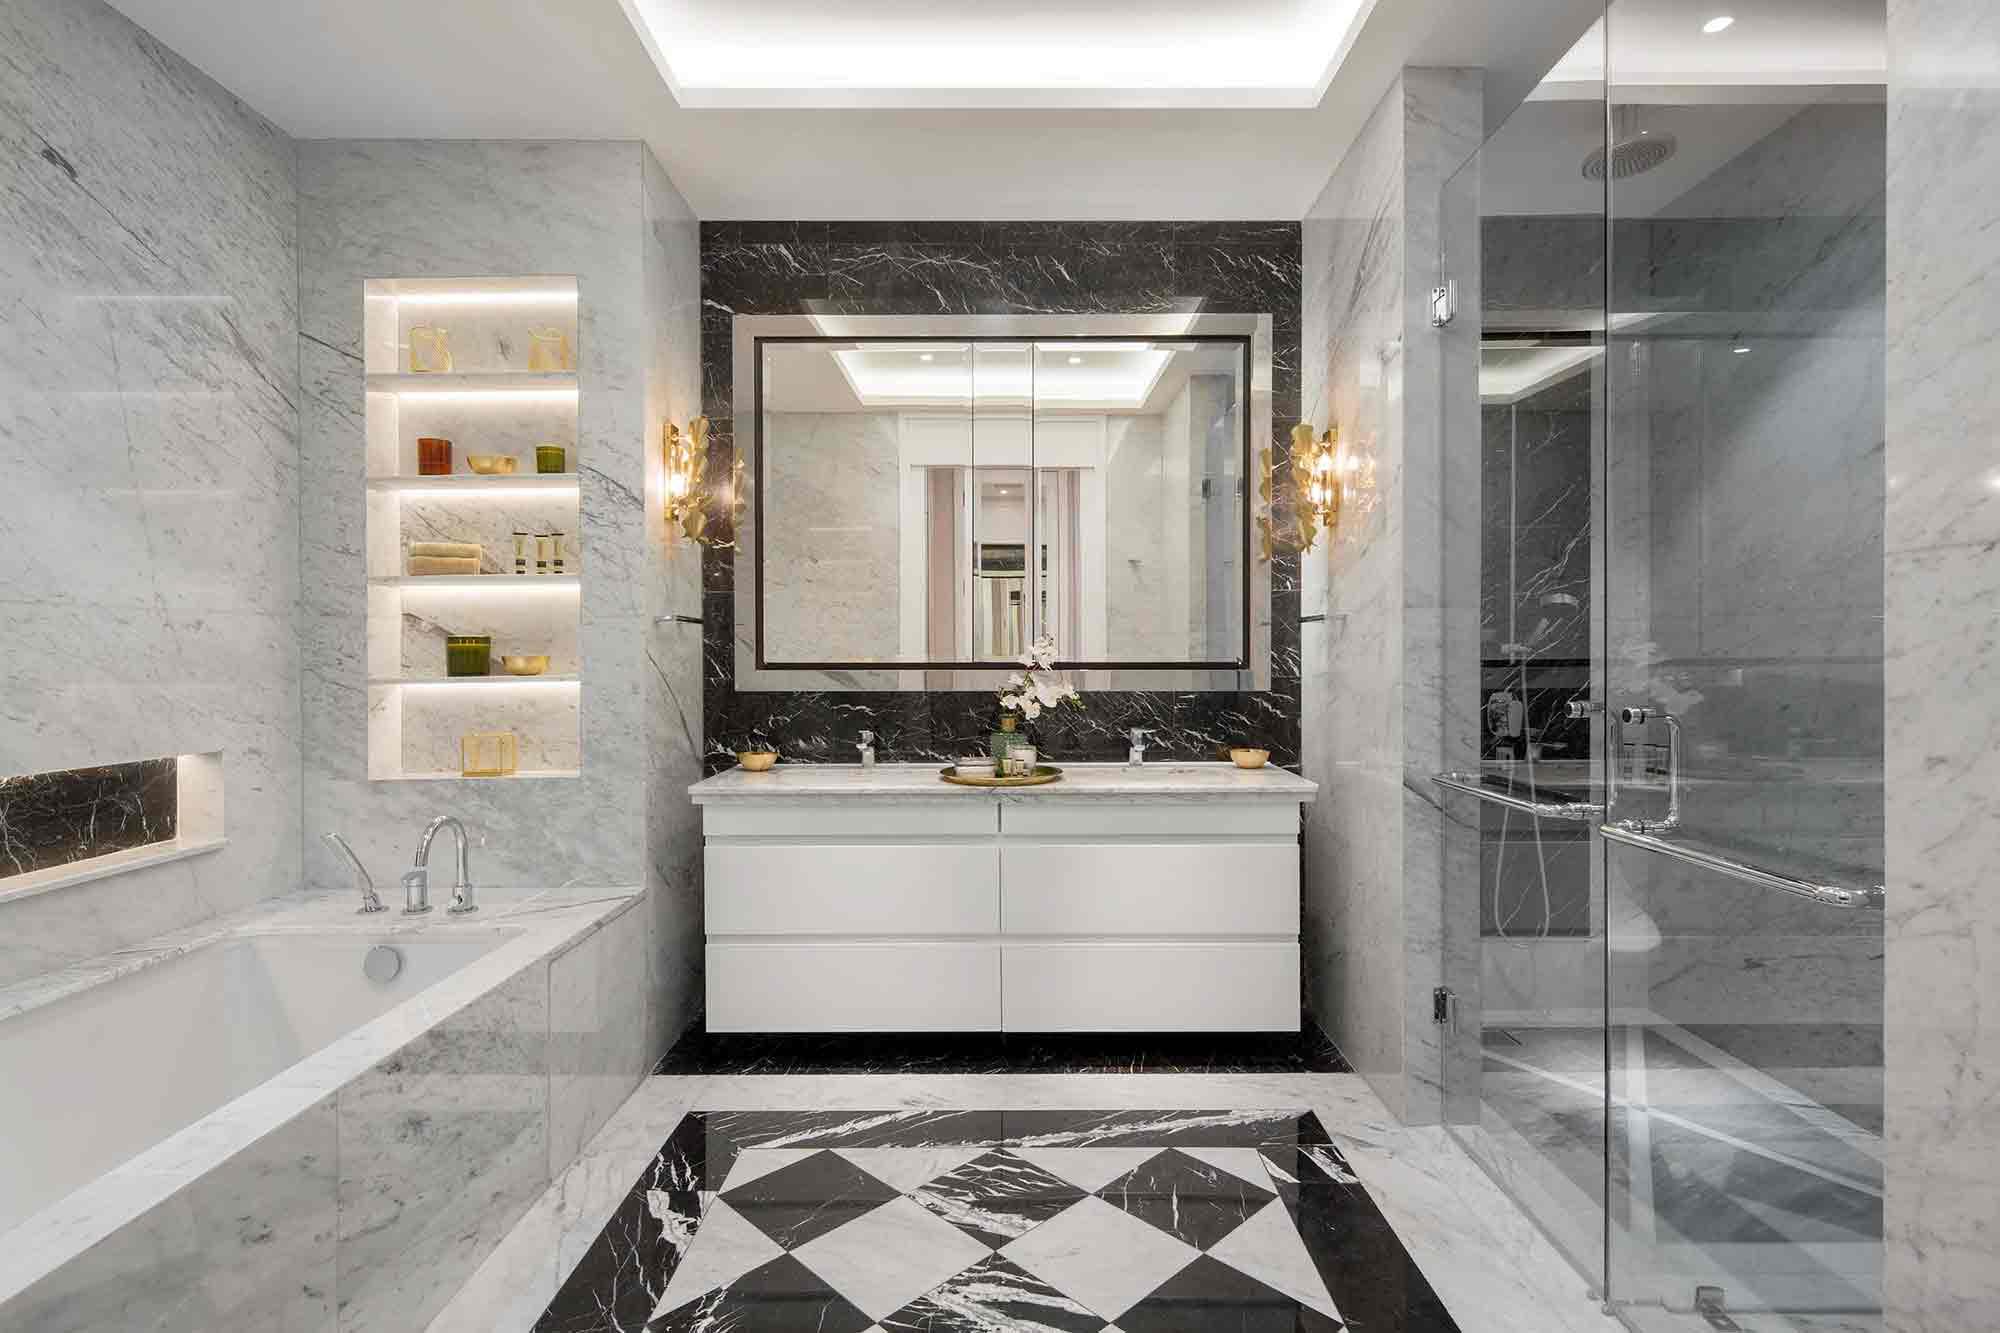 Kamar mandi mewah bernuansa monokrom, oleh Mark Associates, via arsitag.com